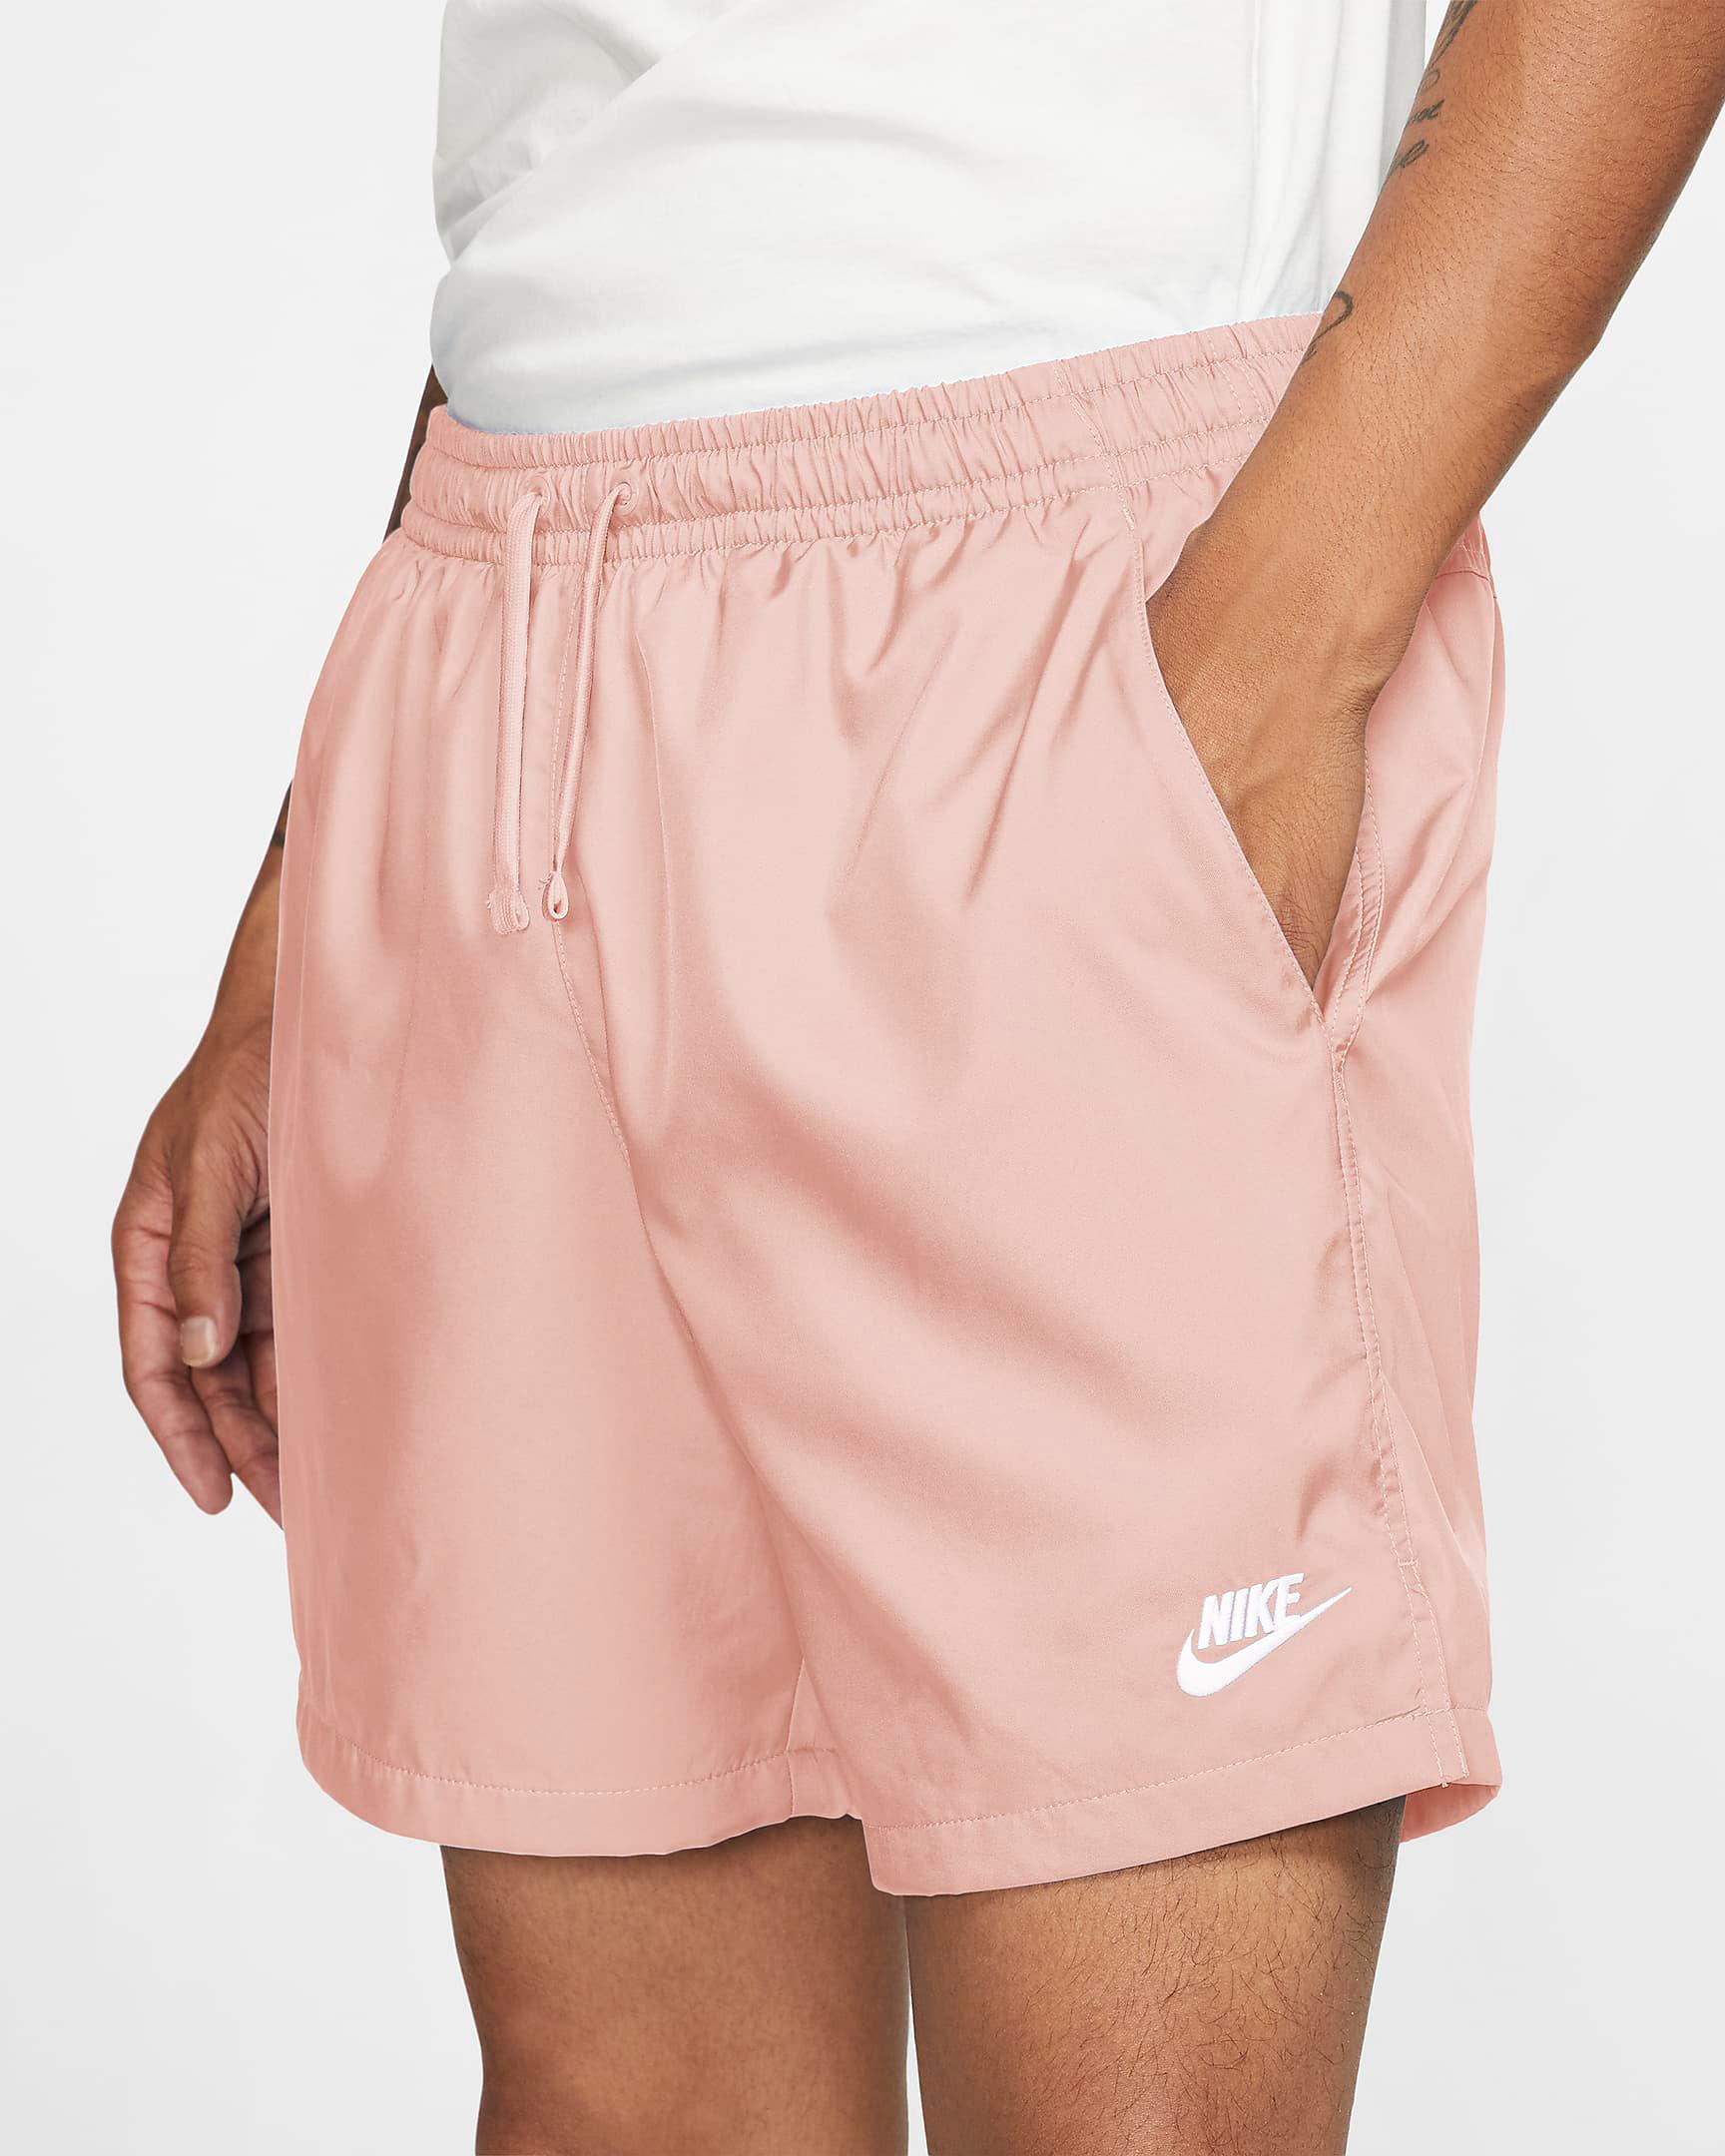 nike-arctic-orange-woven-shorts